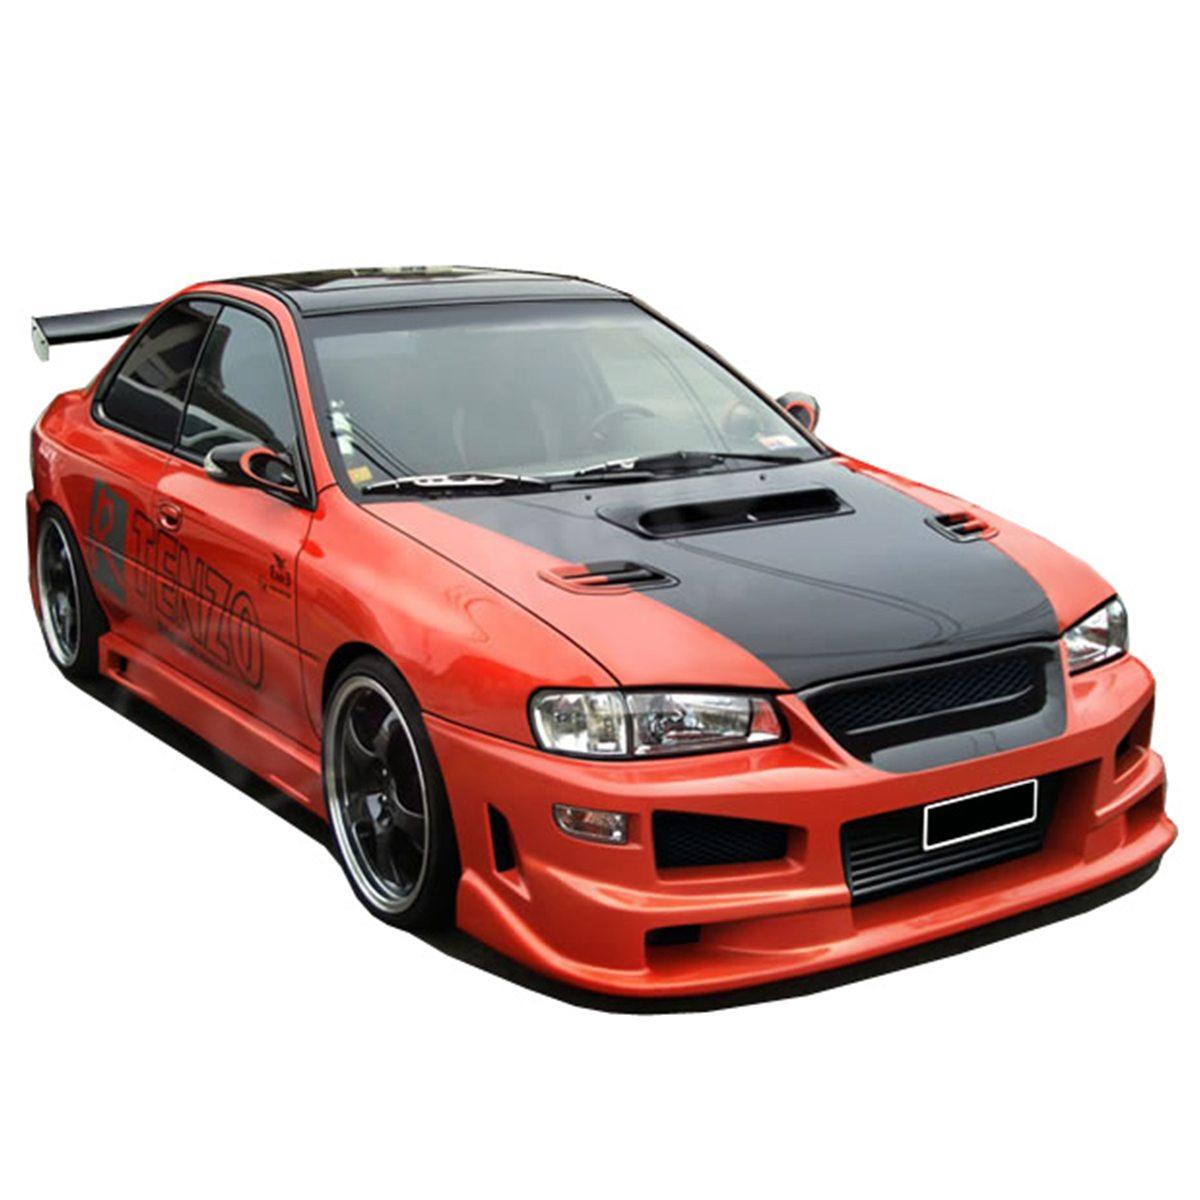 Subaru-Impreza-Race-Frt-PCN109